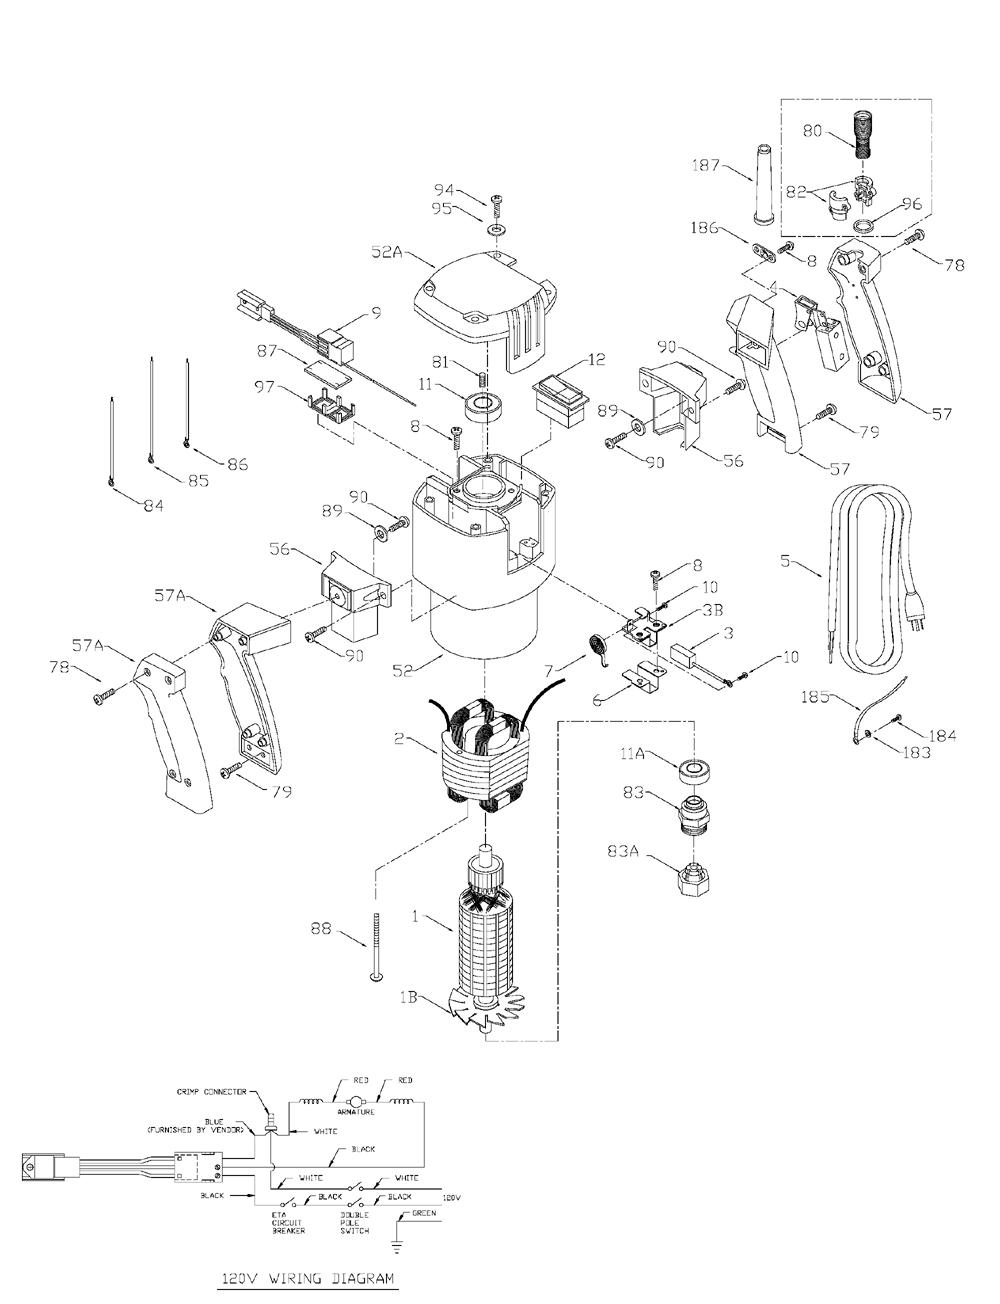 7538-portercable-T3-PB-1Break Down